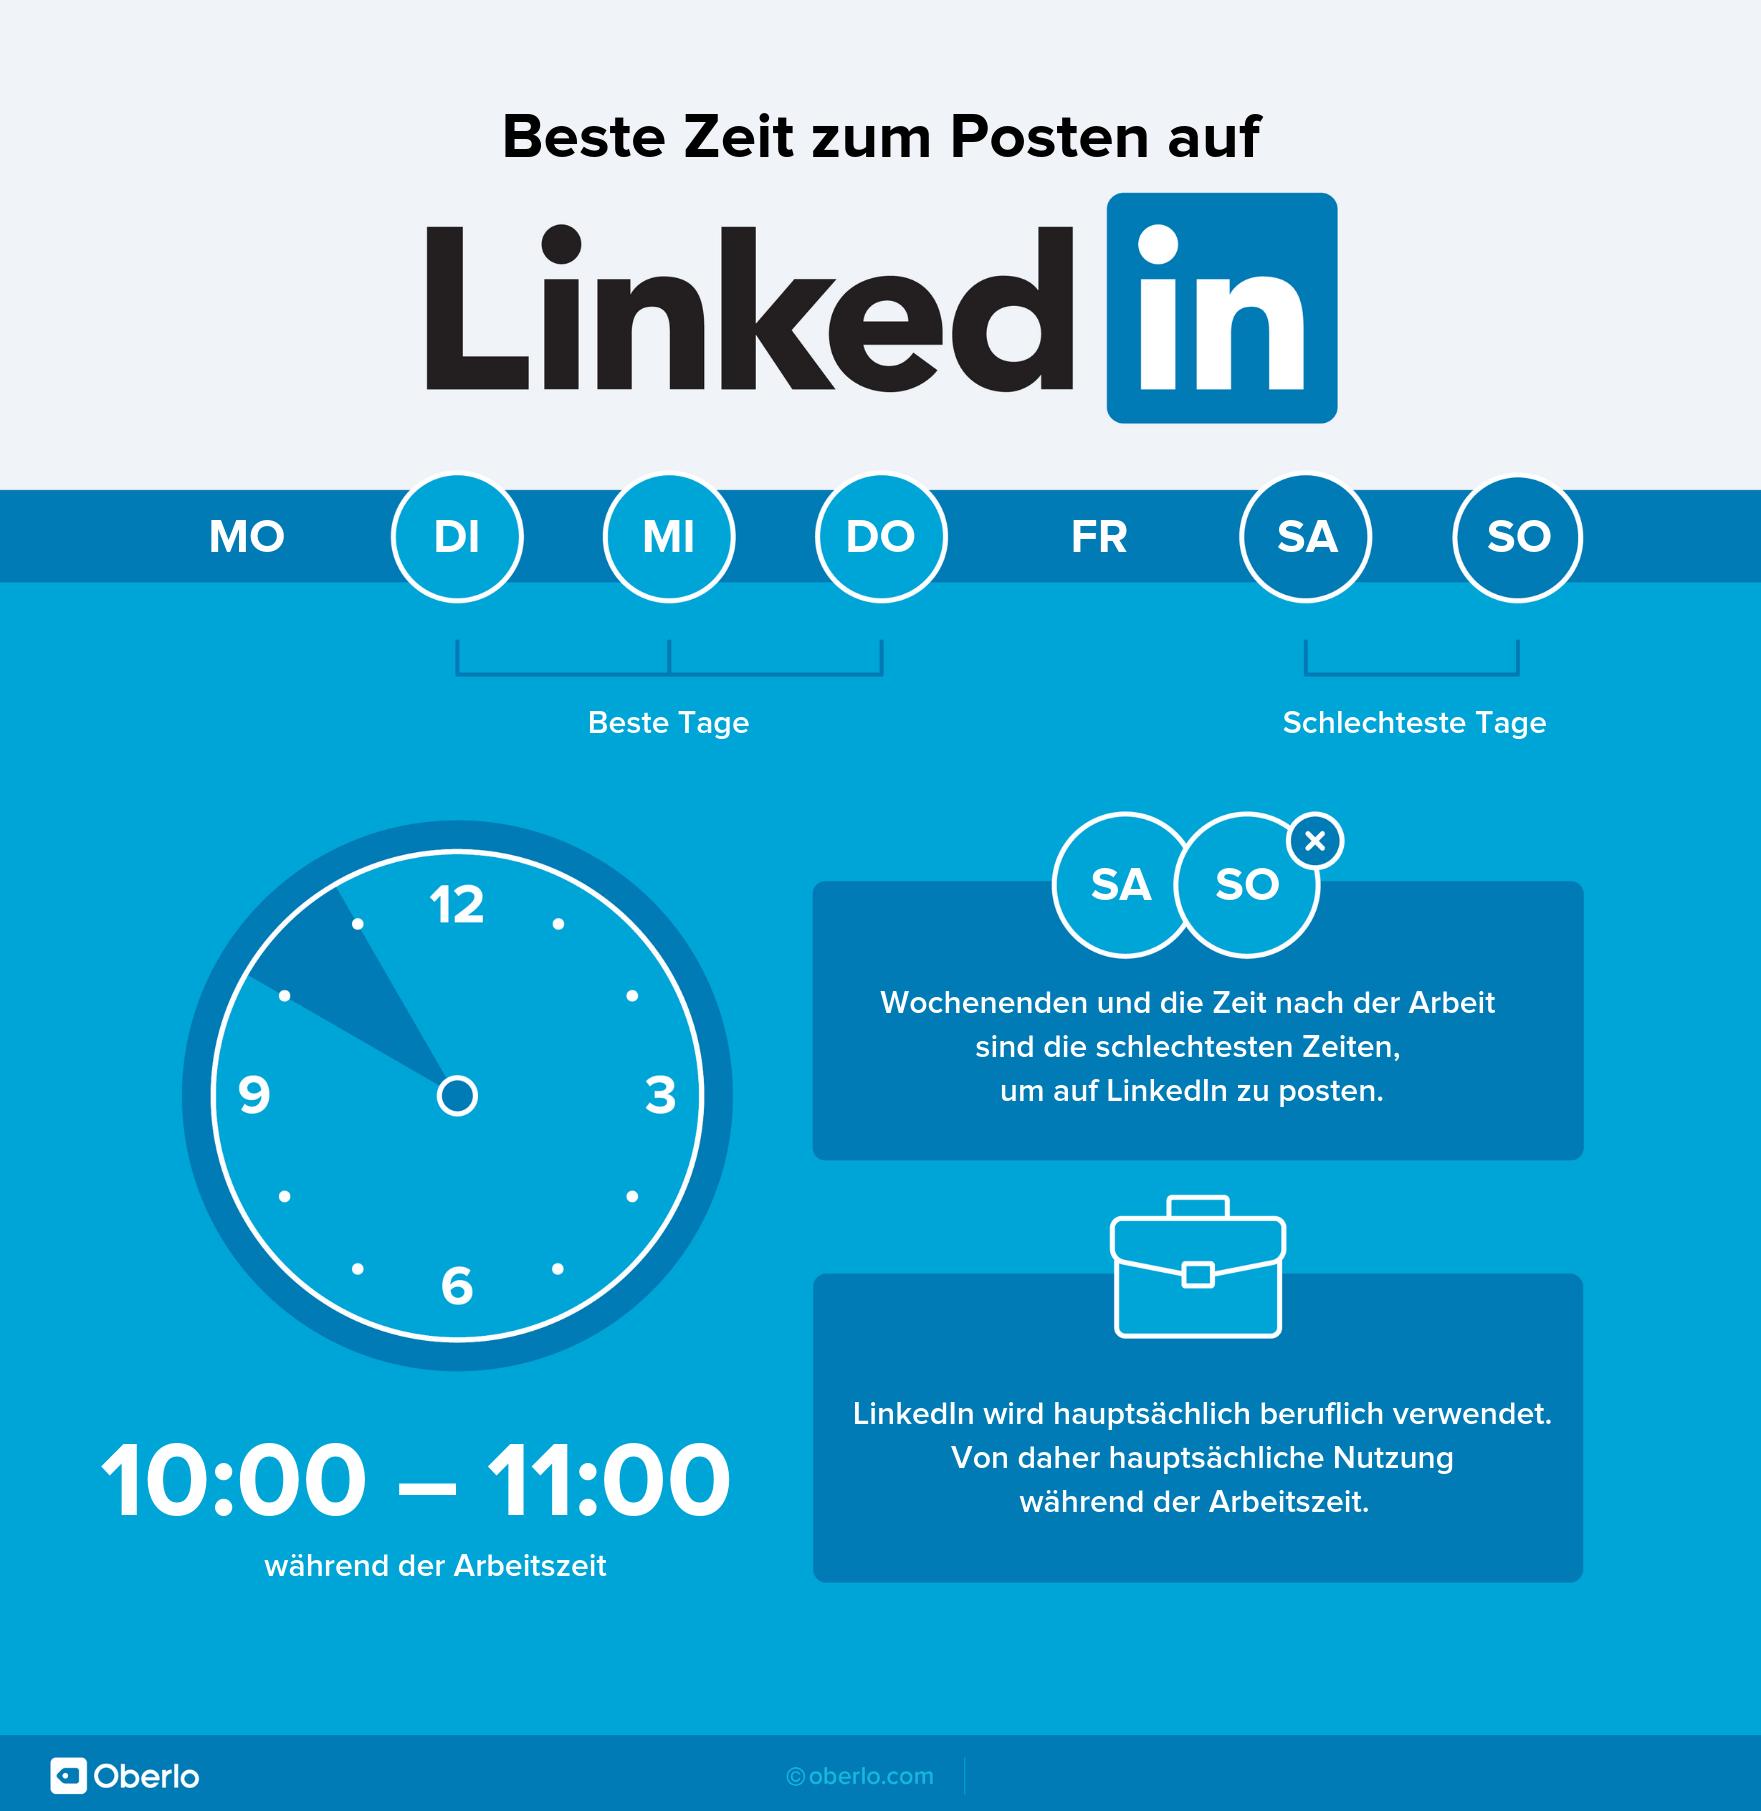 Beste Zeit zum Posten - LinkedIn Infografik